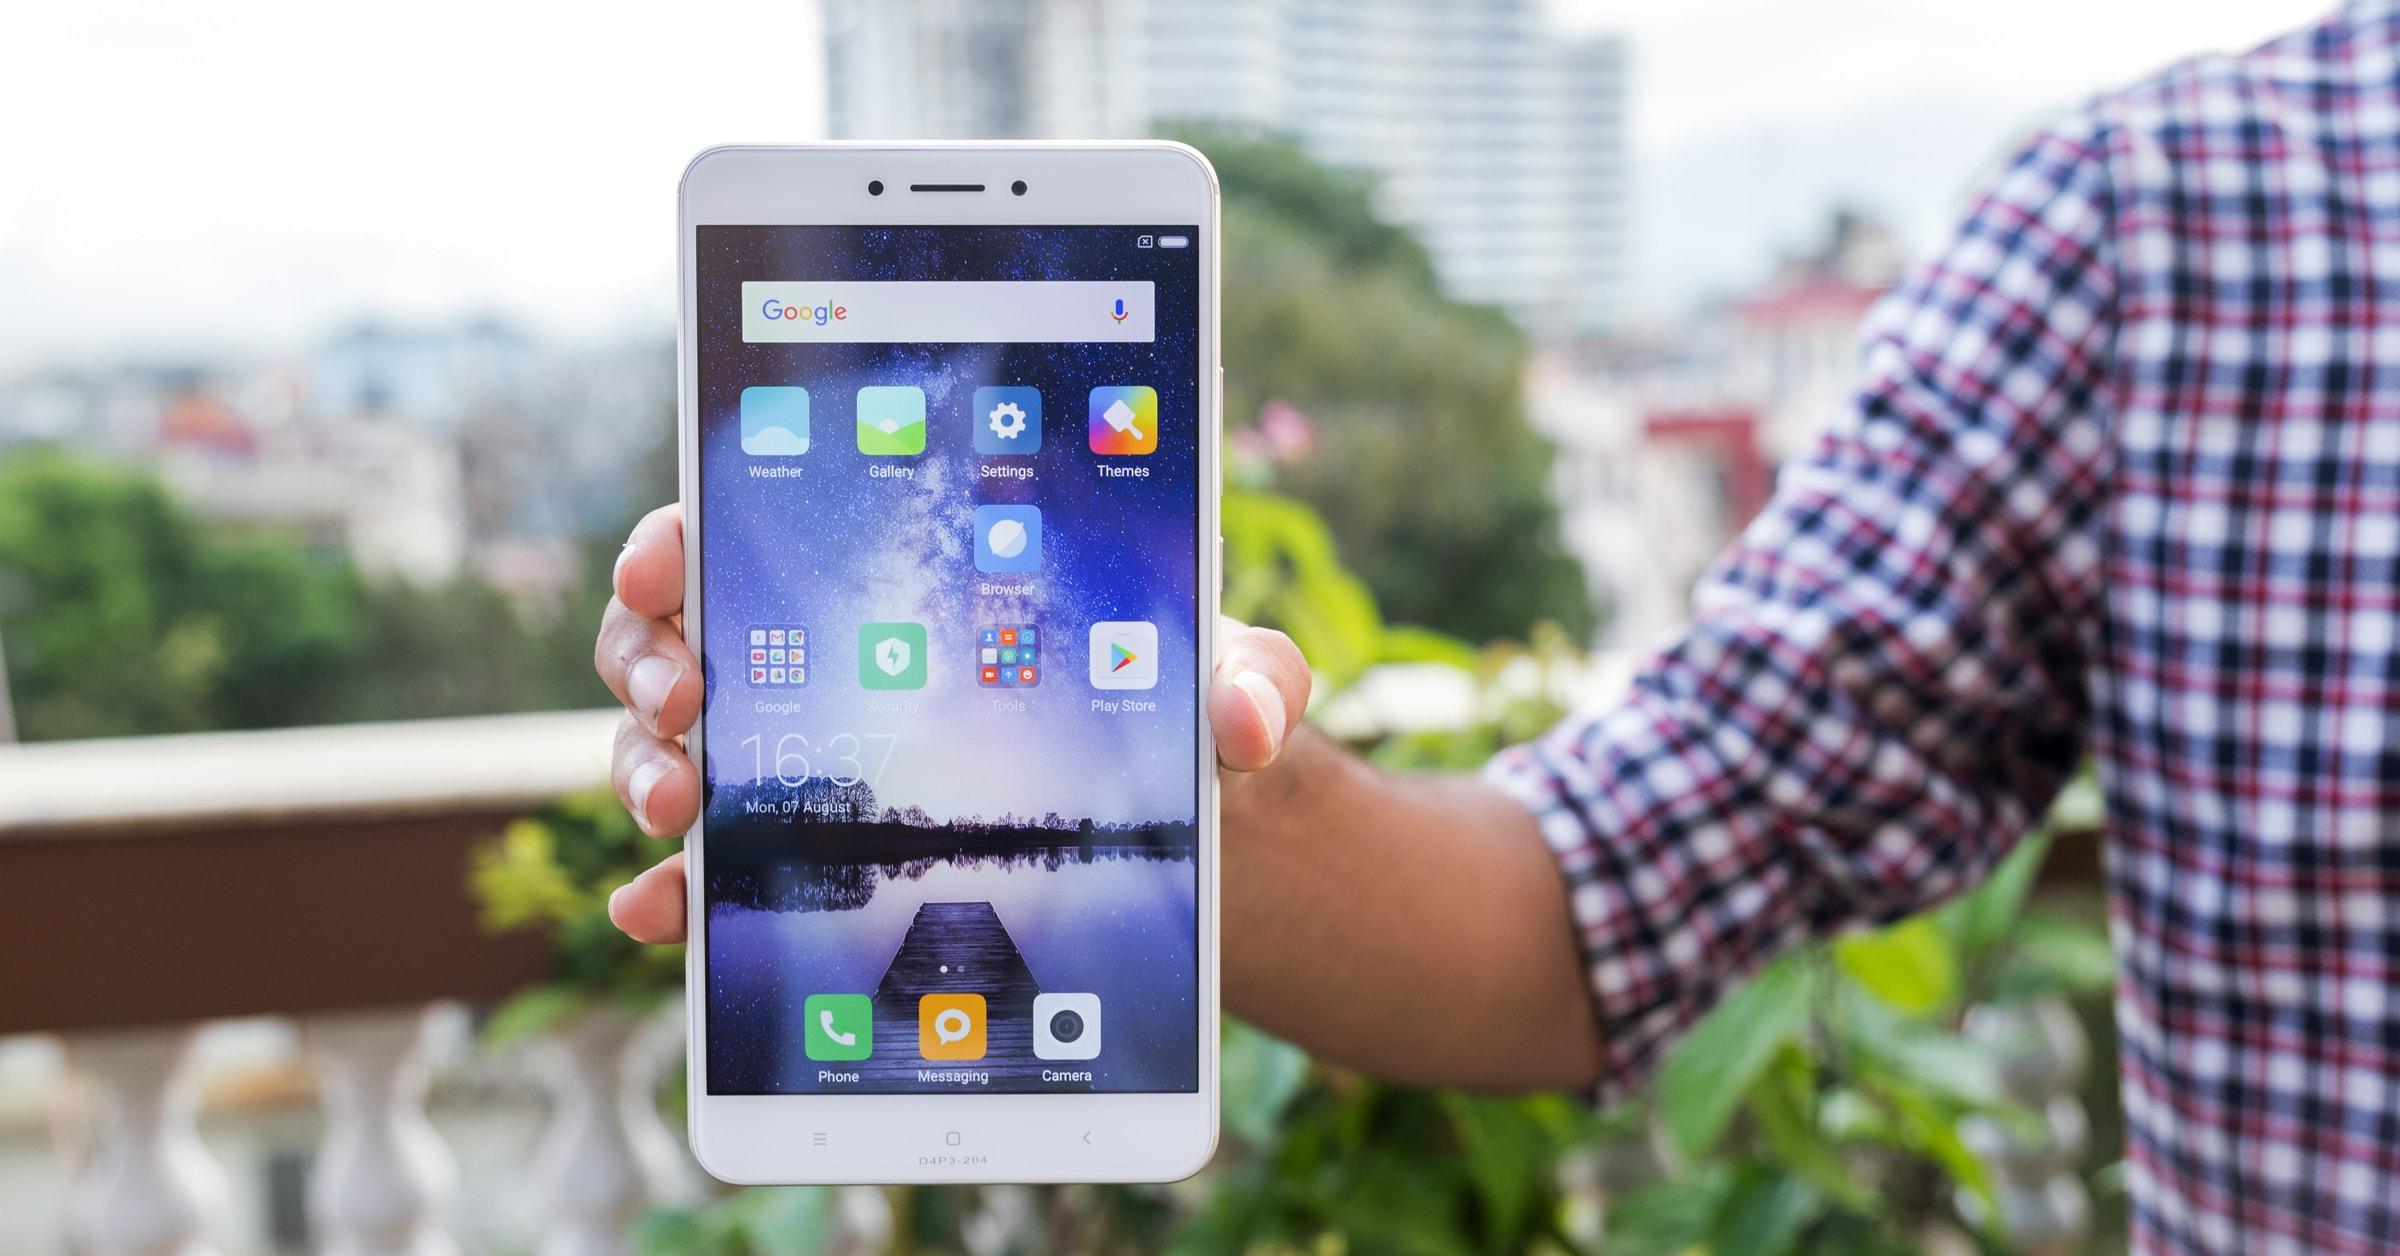 Xiaomi Mi Max 2 Price In Nepal Where To Buy Redmi Note 4 64gb Ram 4gb Distributor 64 Lte Dual Sim